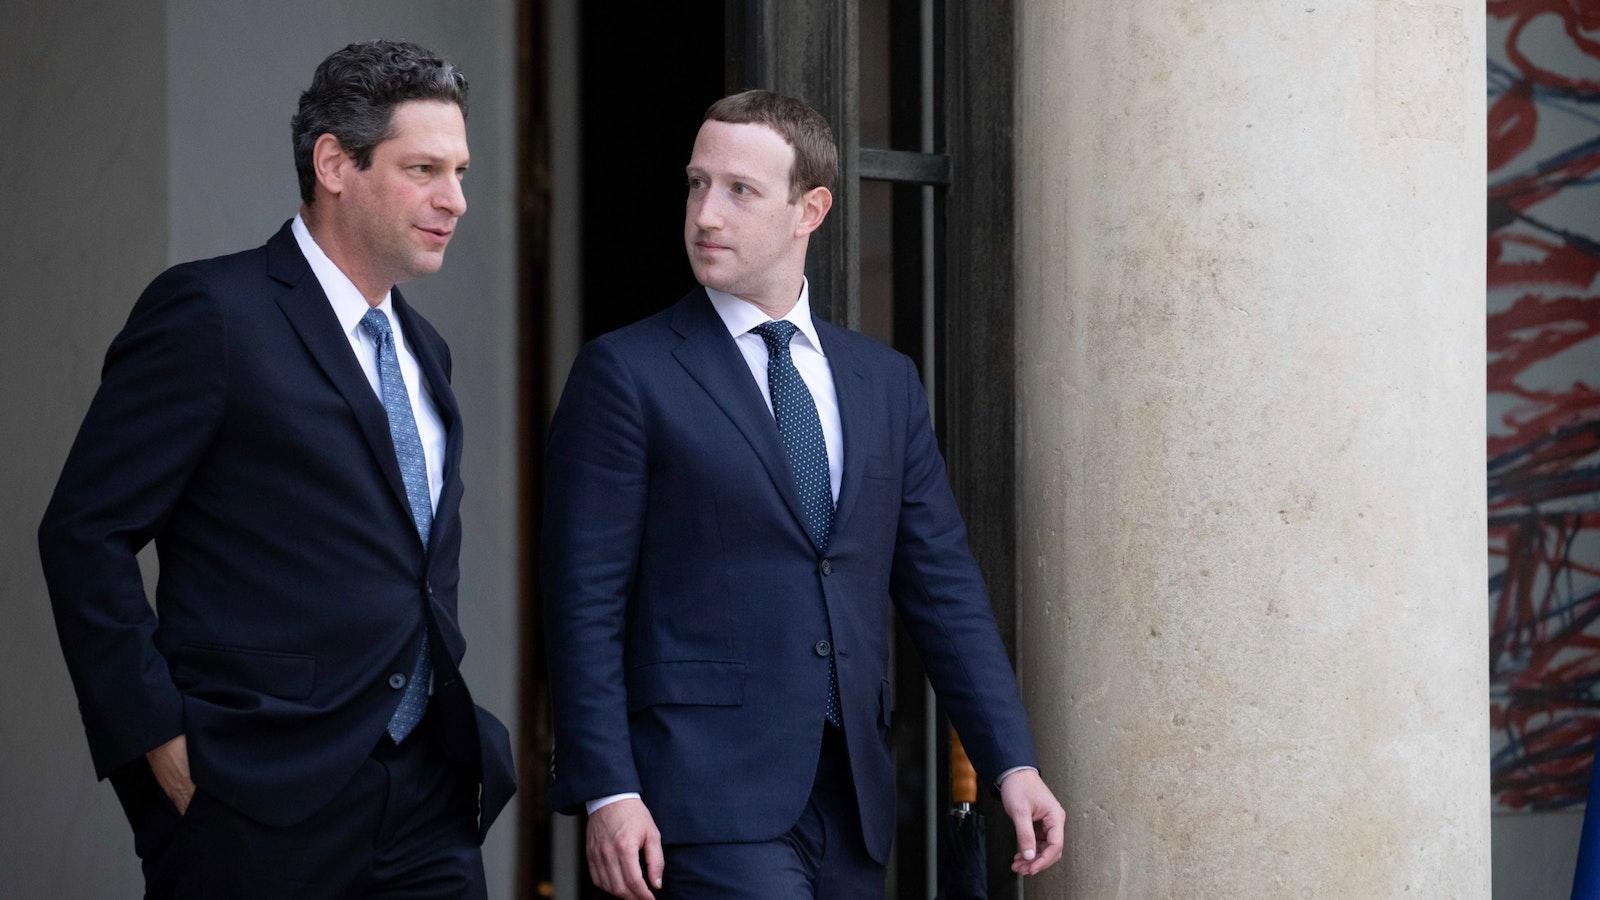 Facebook policy chief Joel Kaplan and CEO Mark Zuckerberg in 2018. Photo: Bloomberg